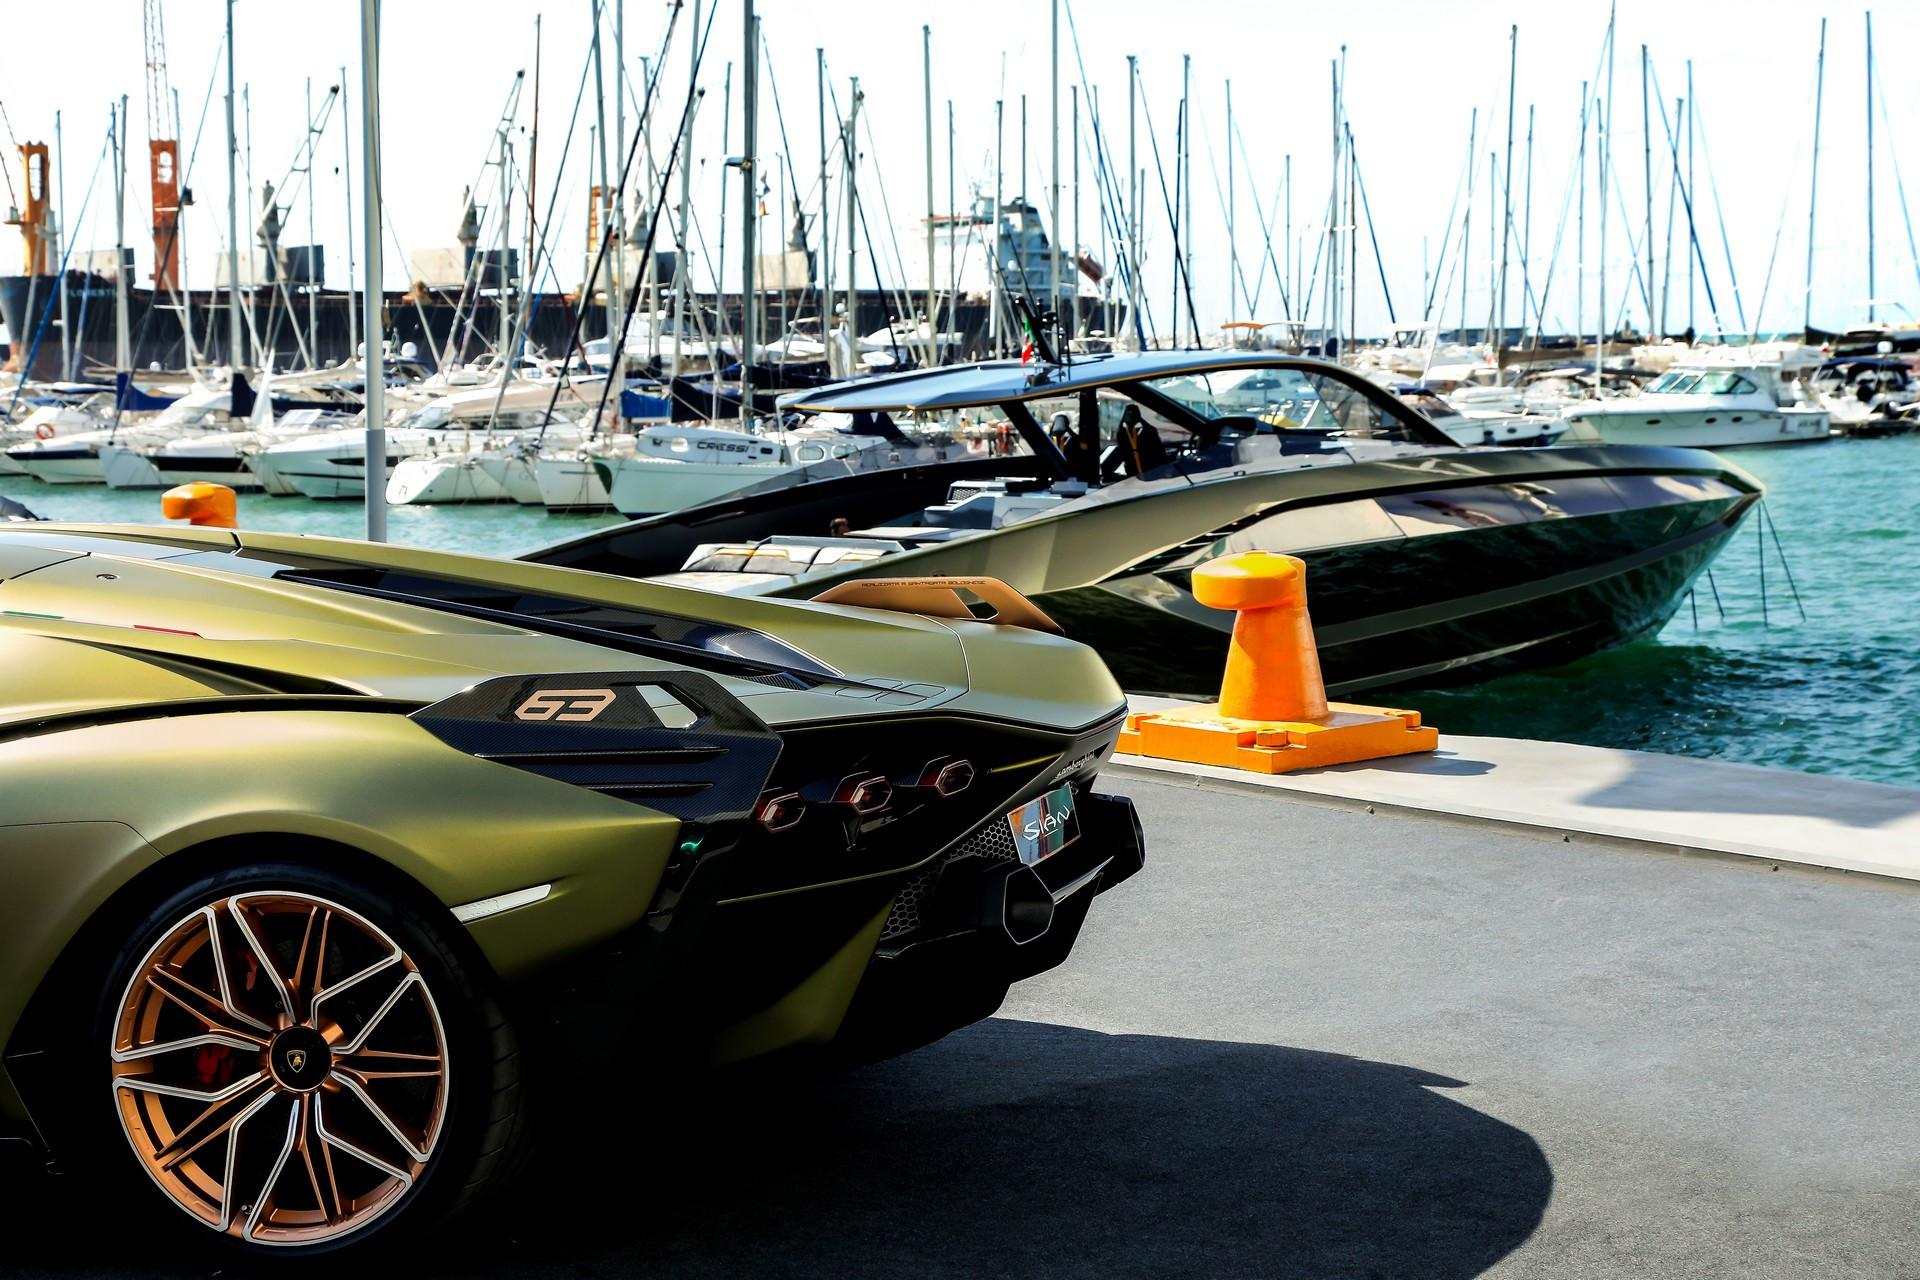 Du thuyền lấy cảm hứng từ siêu xe Lamborghini Sian